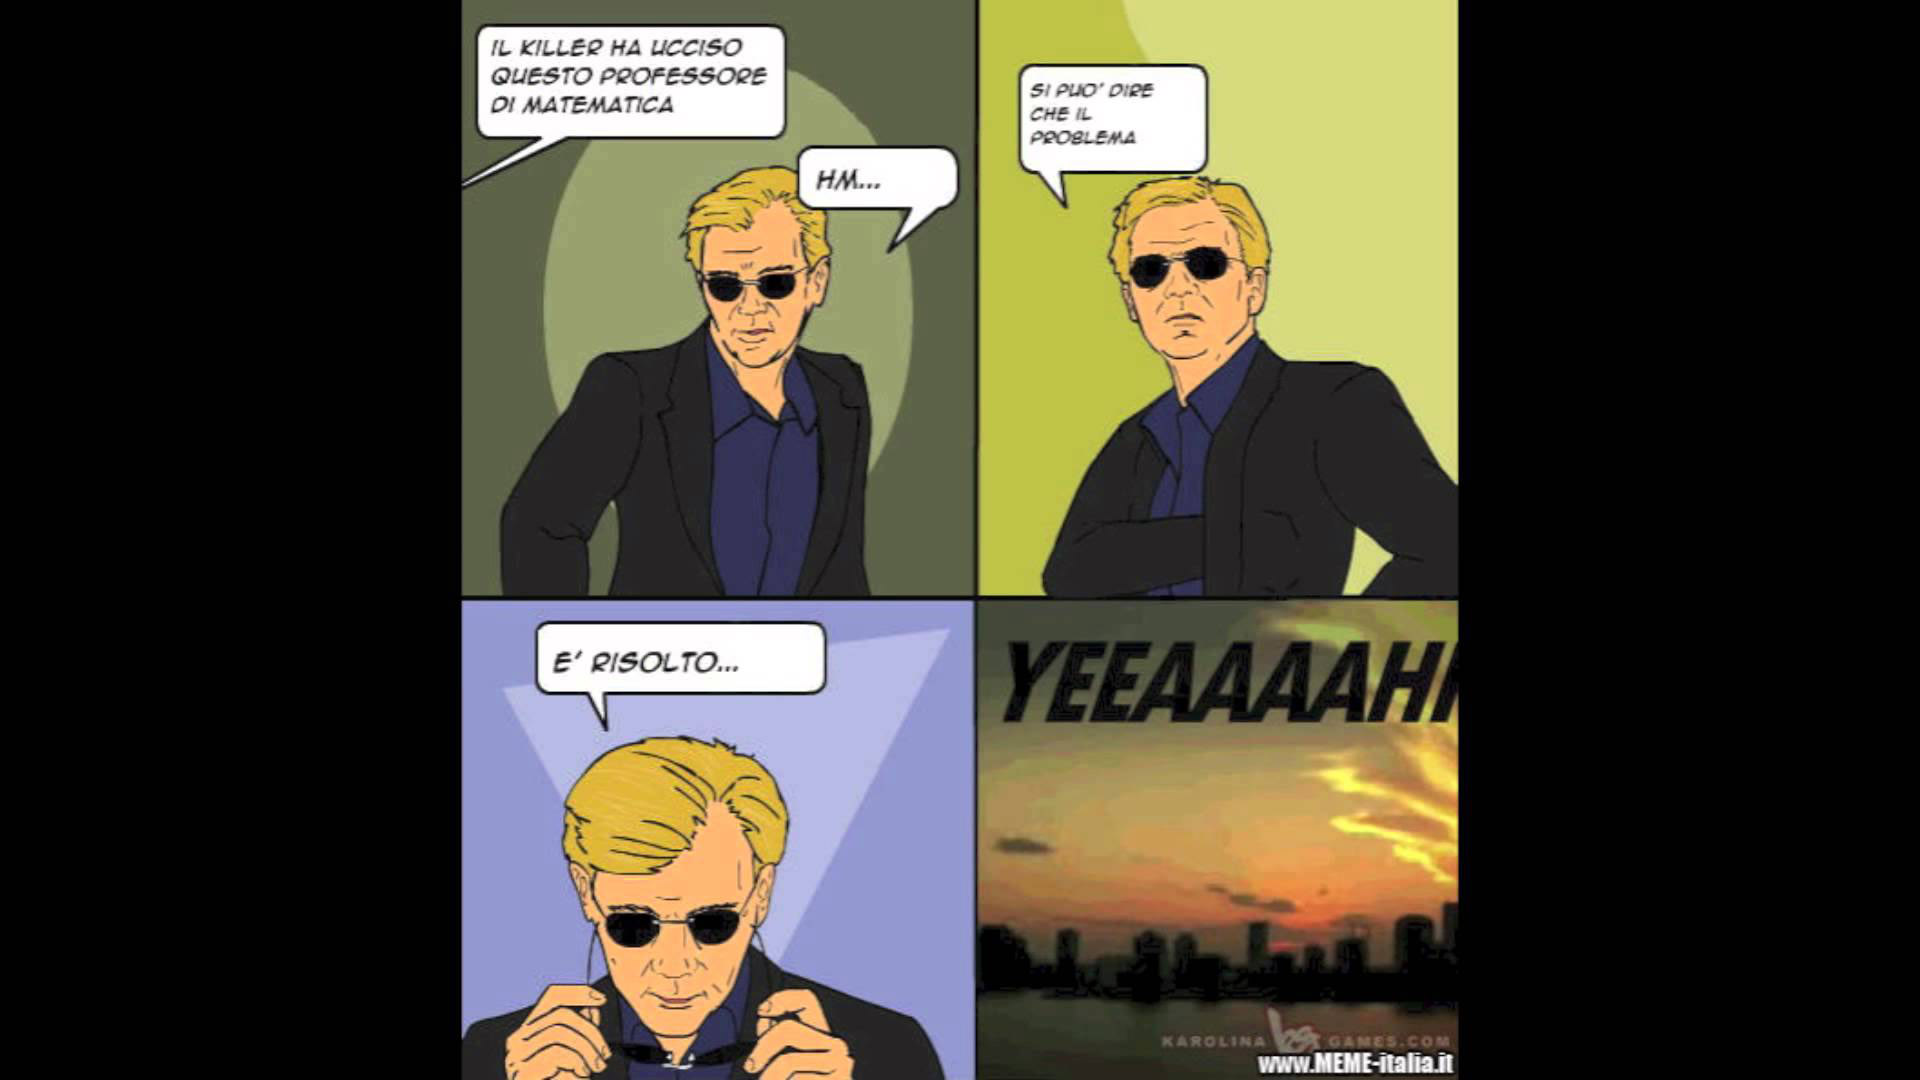 Csi 4 Pane Comics Know Your Meme